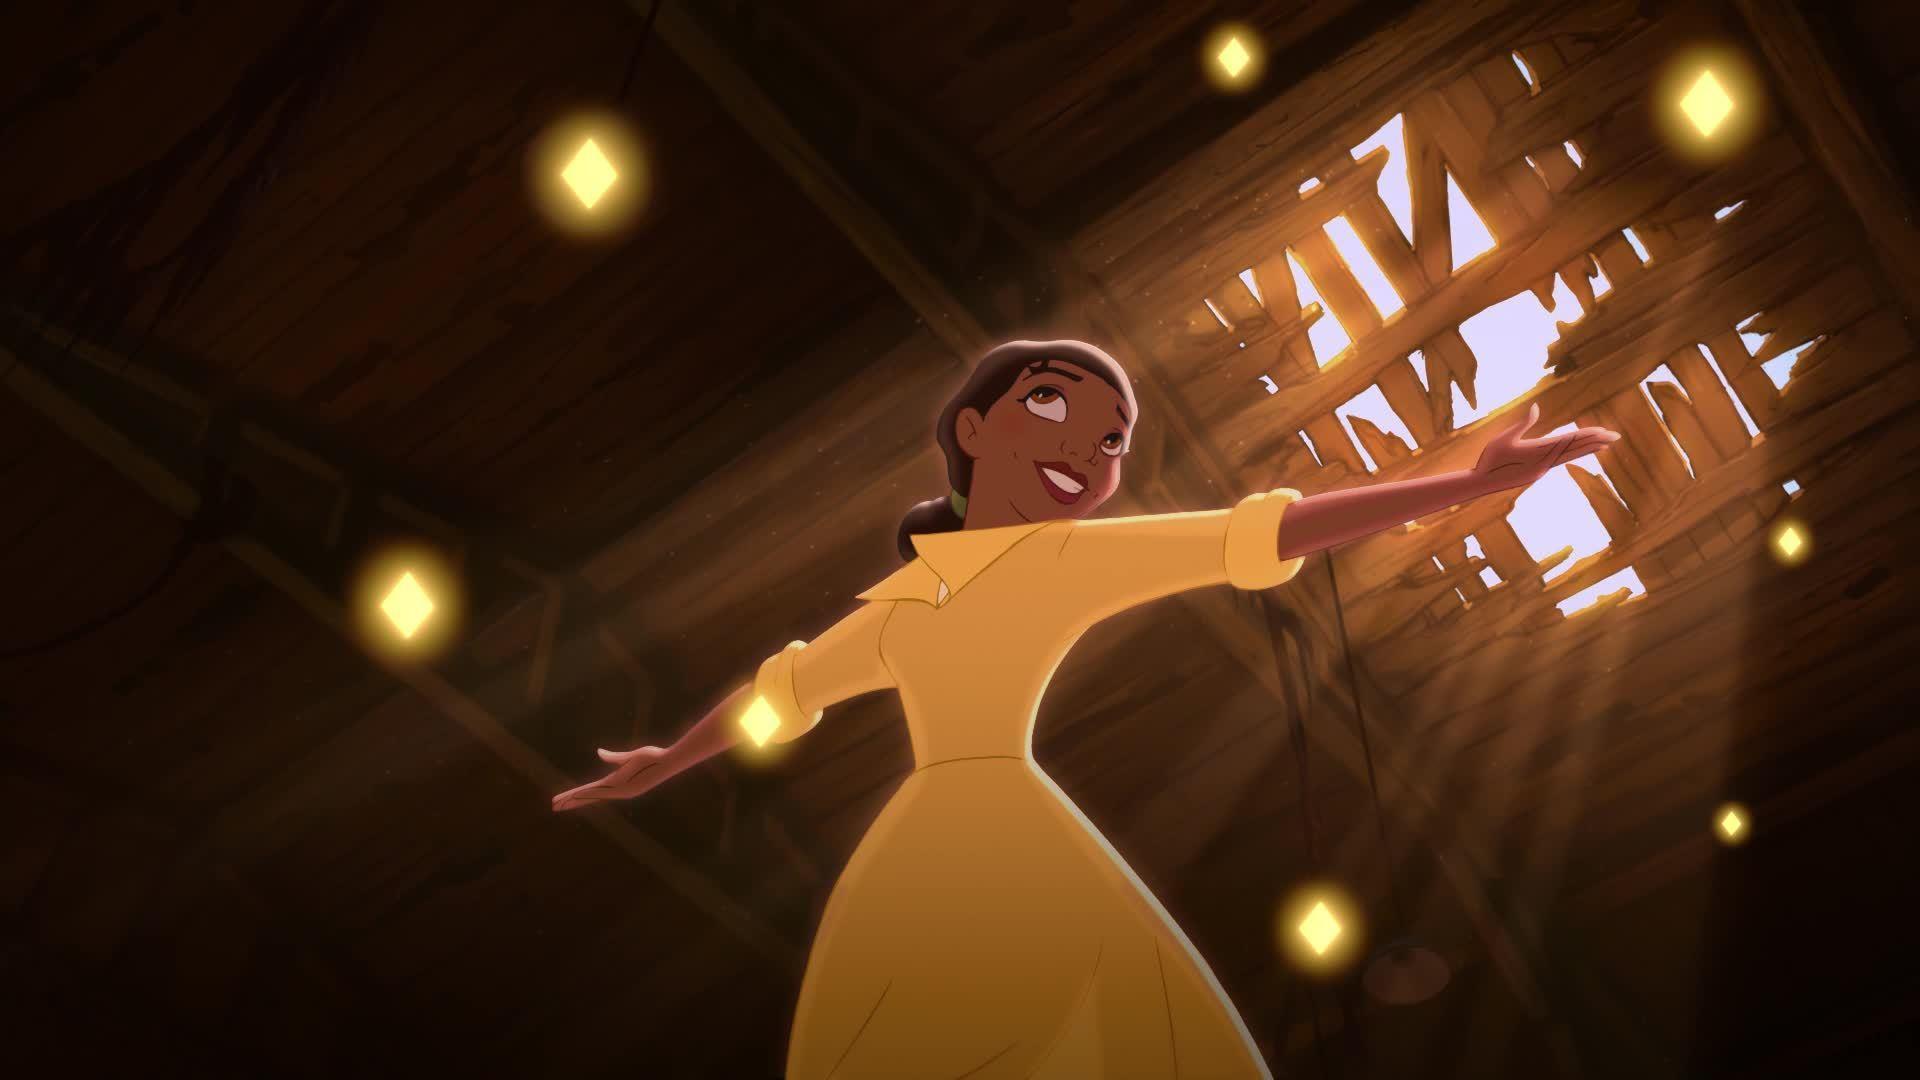 Celebrate Tiana | Ultimate Princess Celebration